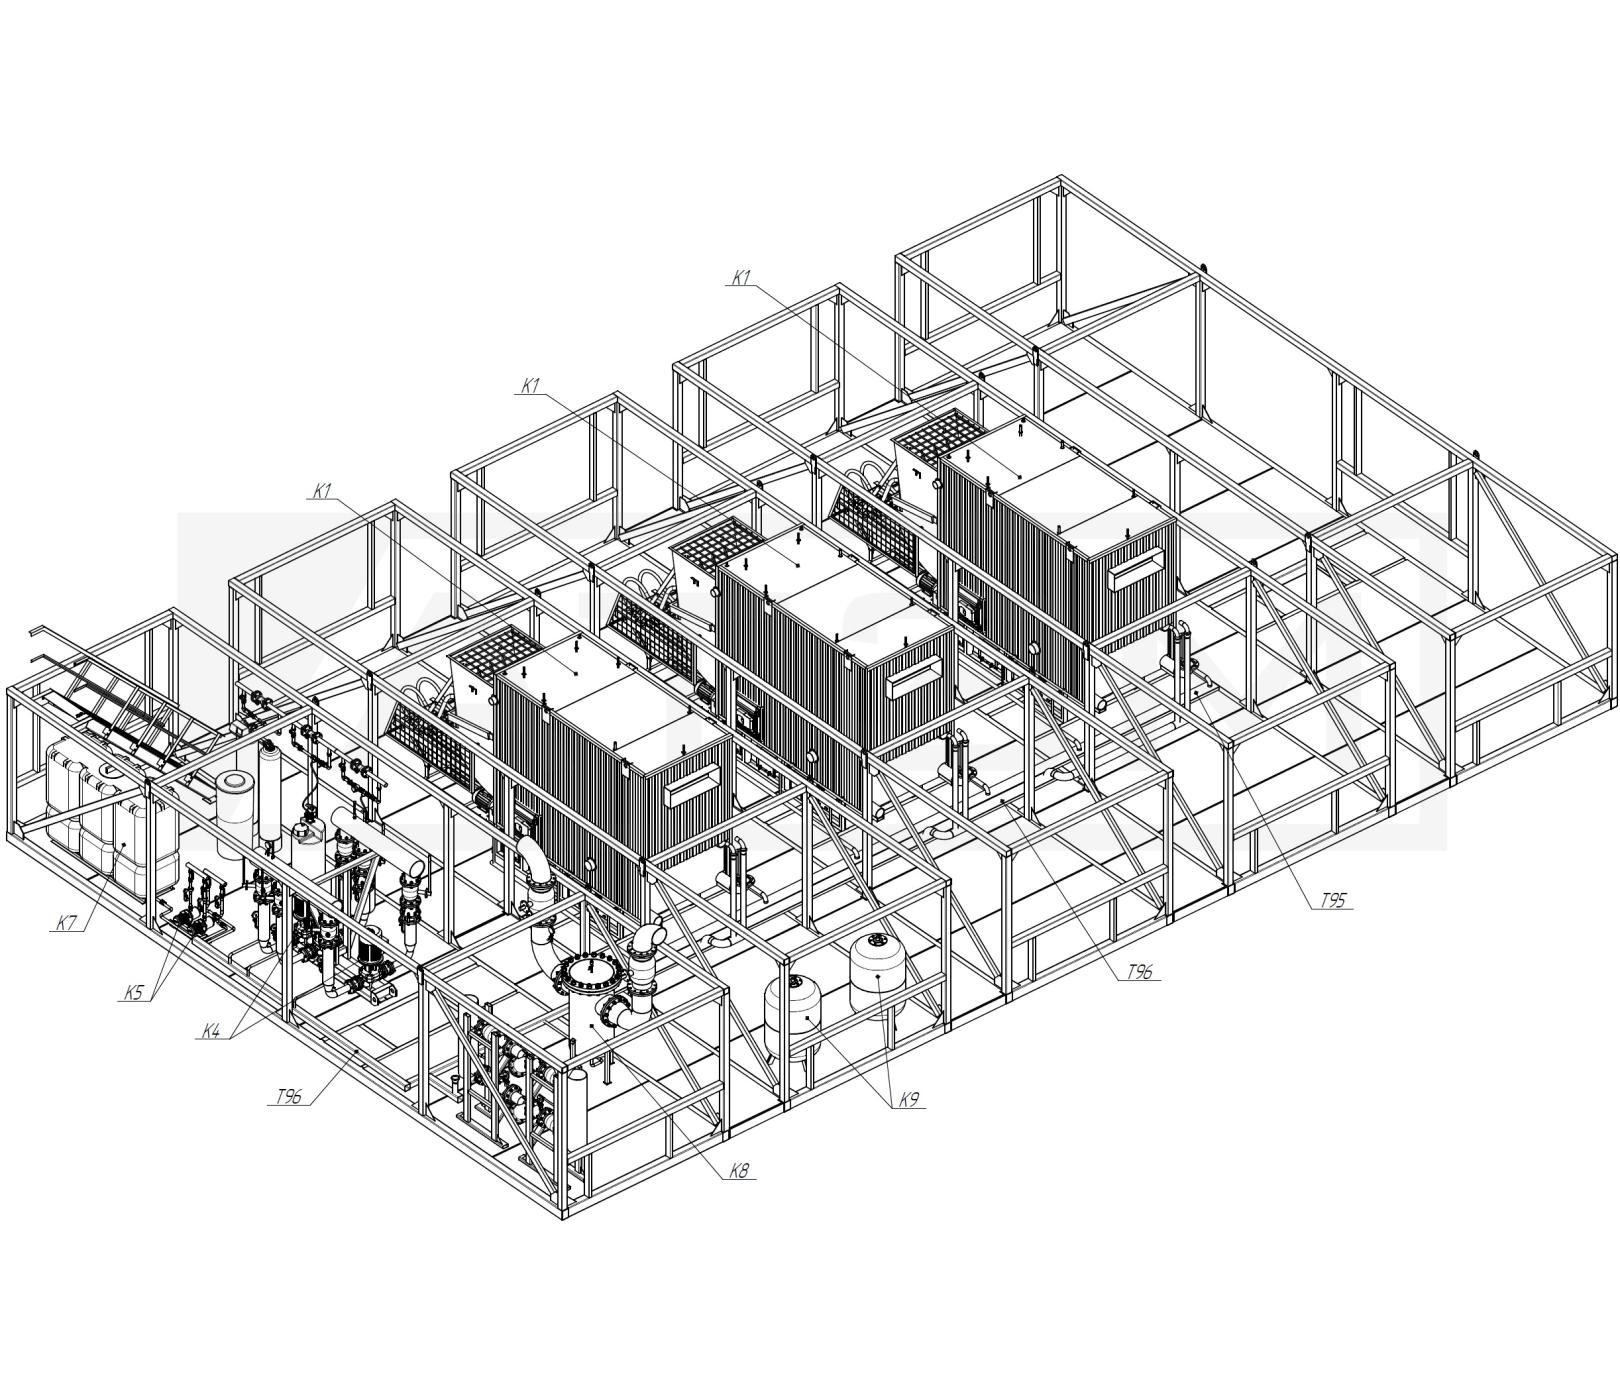 Трубопроводы Т95,Т96. БМК-7,5 (3хКВм-2,5)